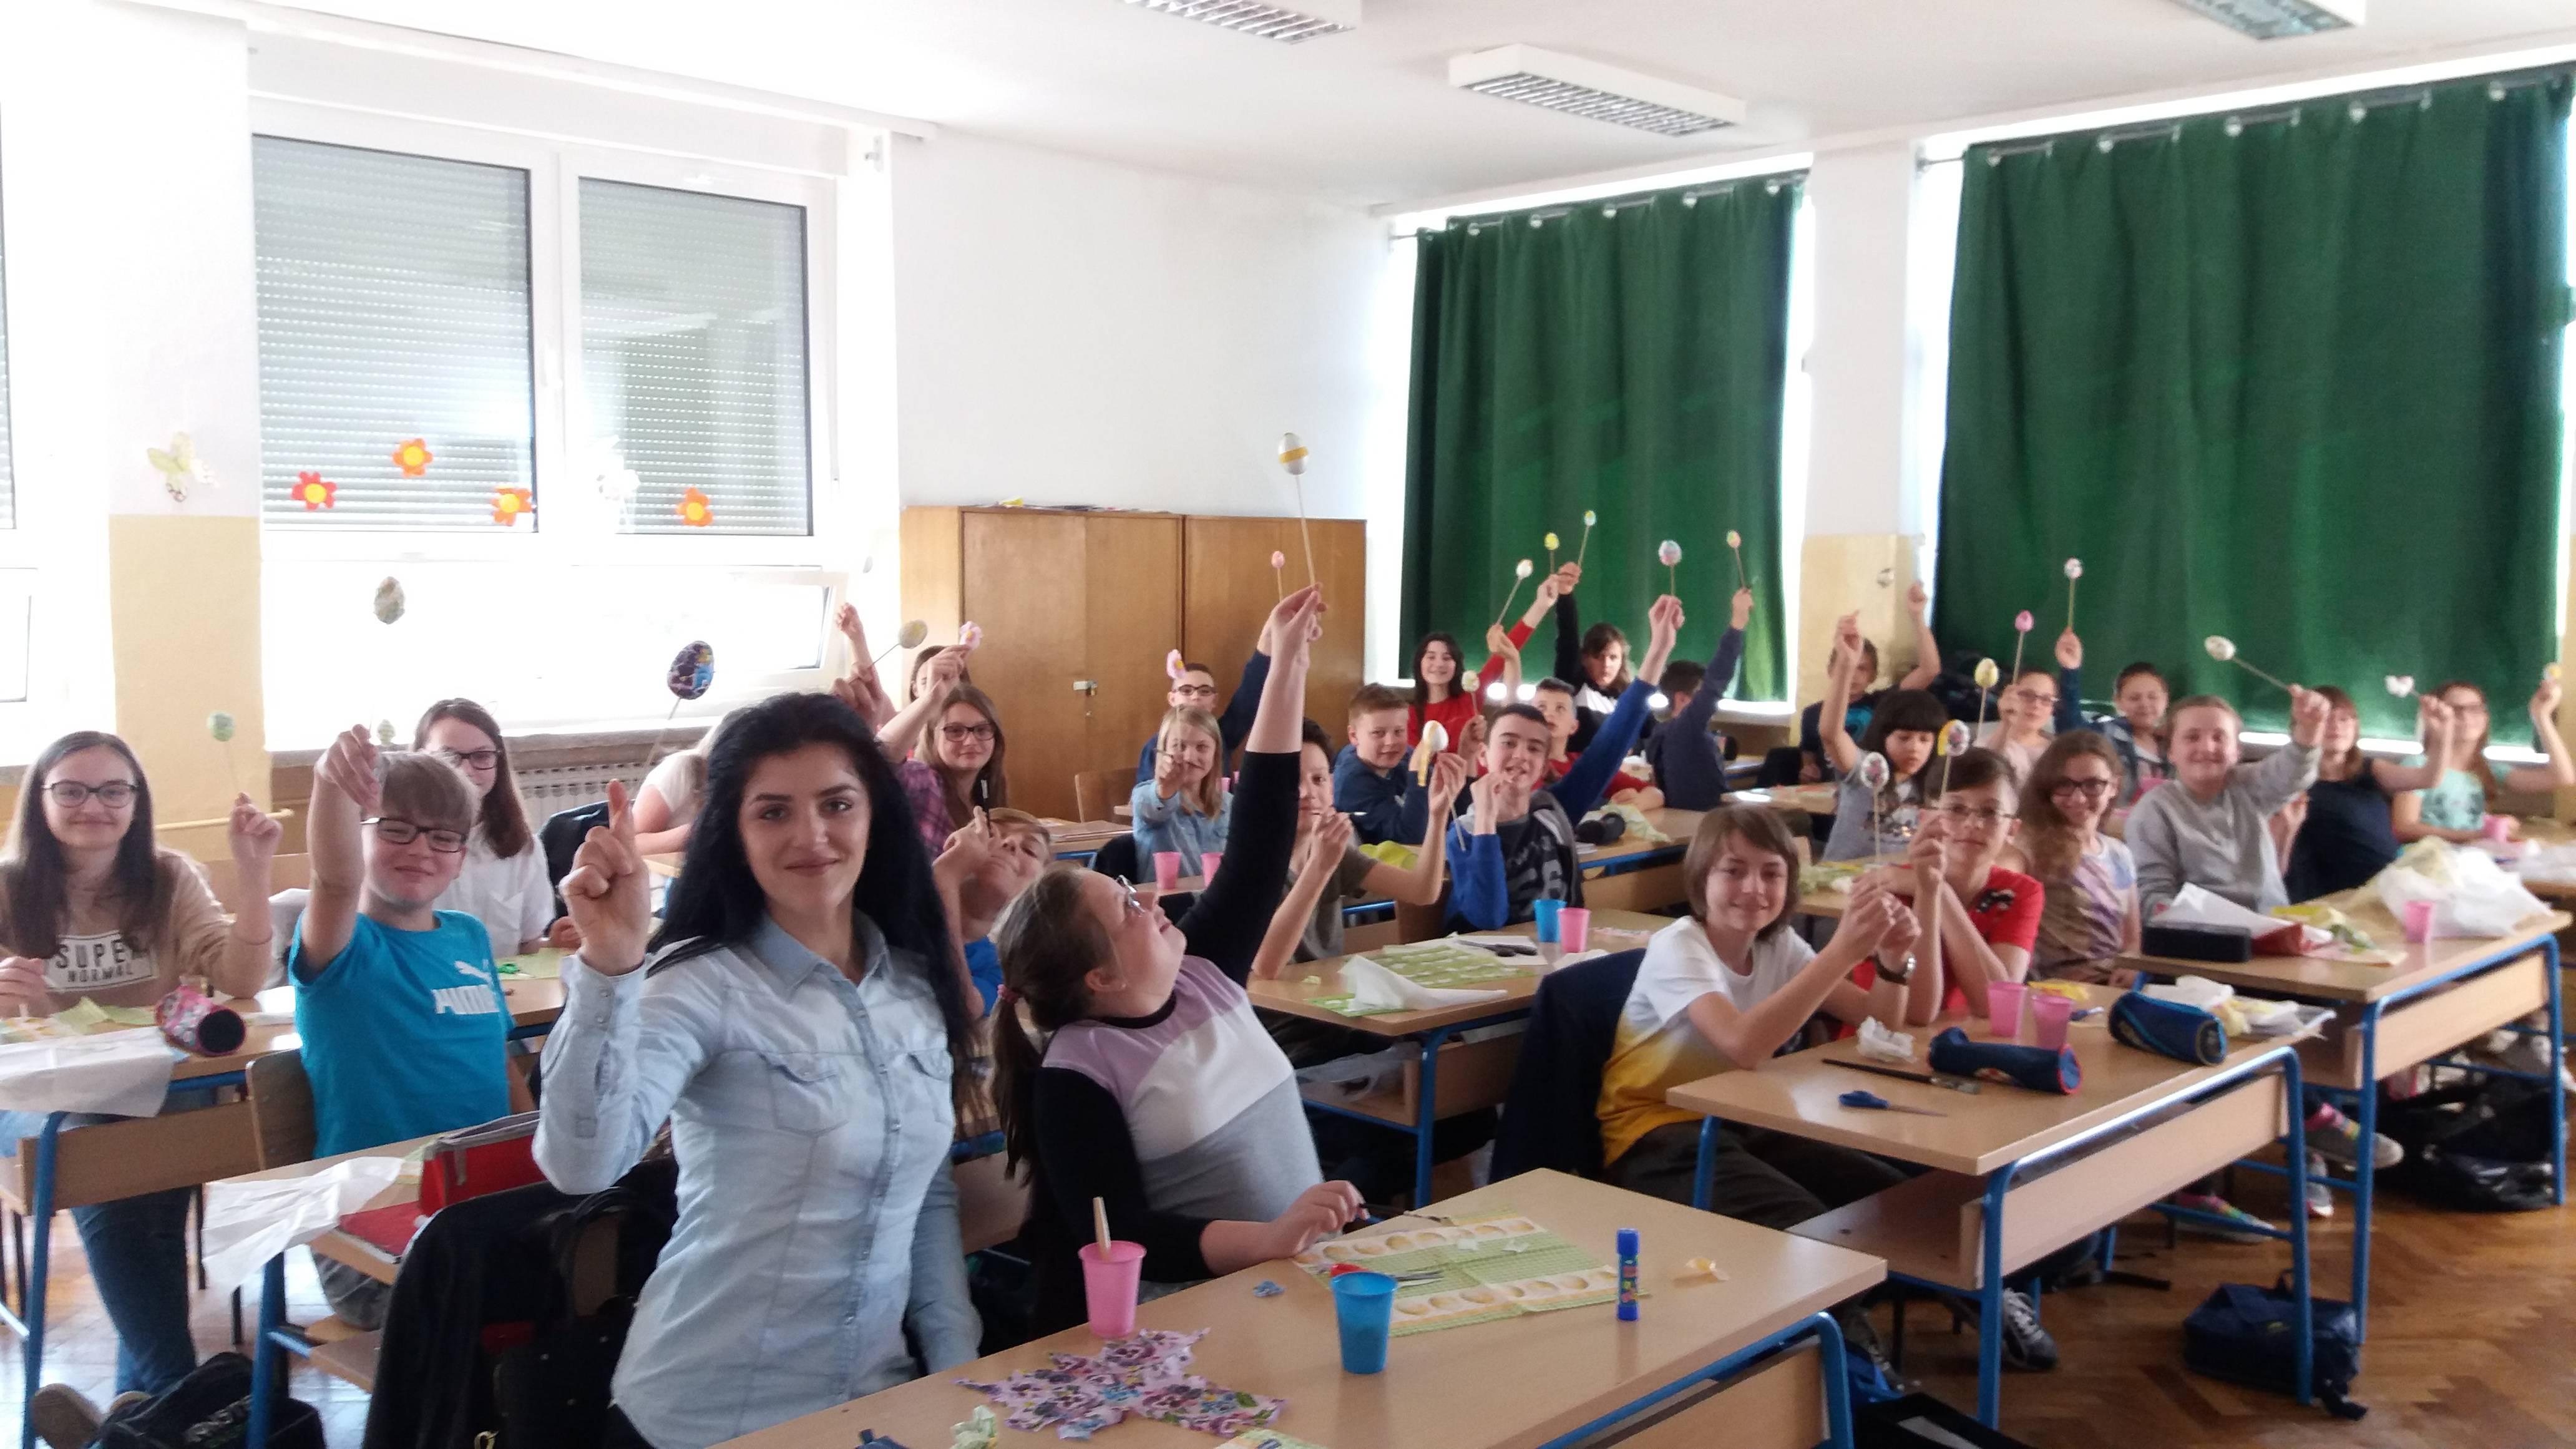 Osnovna Skola Dragutina Domjanica Sveti Ivan Zelina Naslovnica